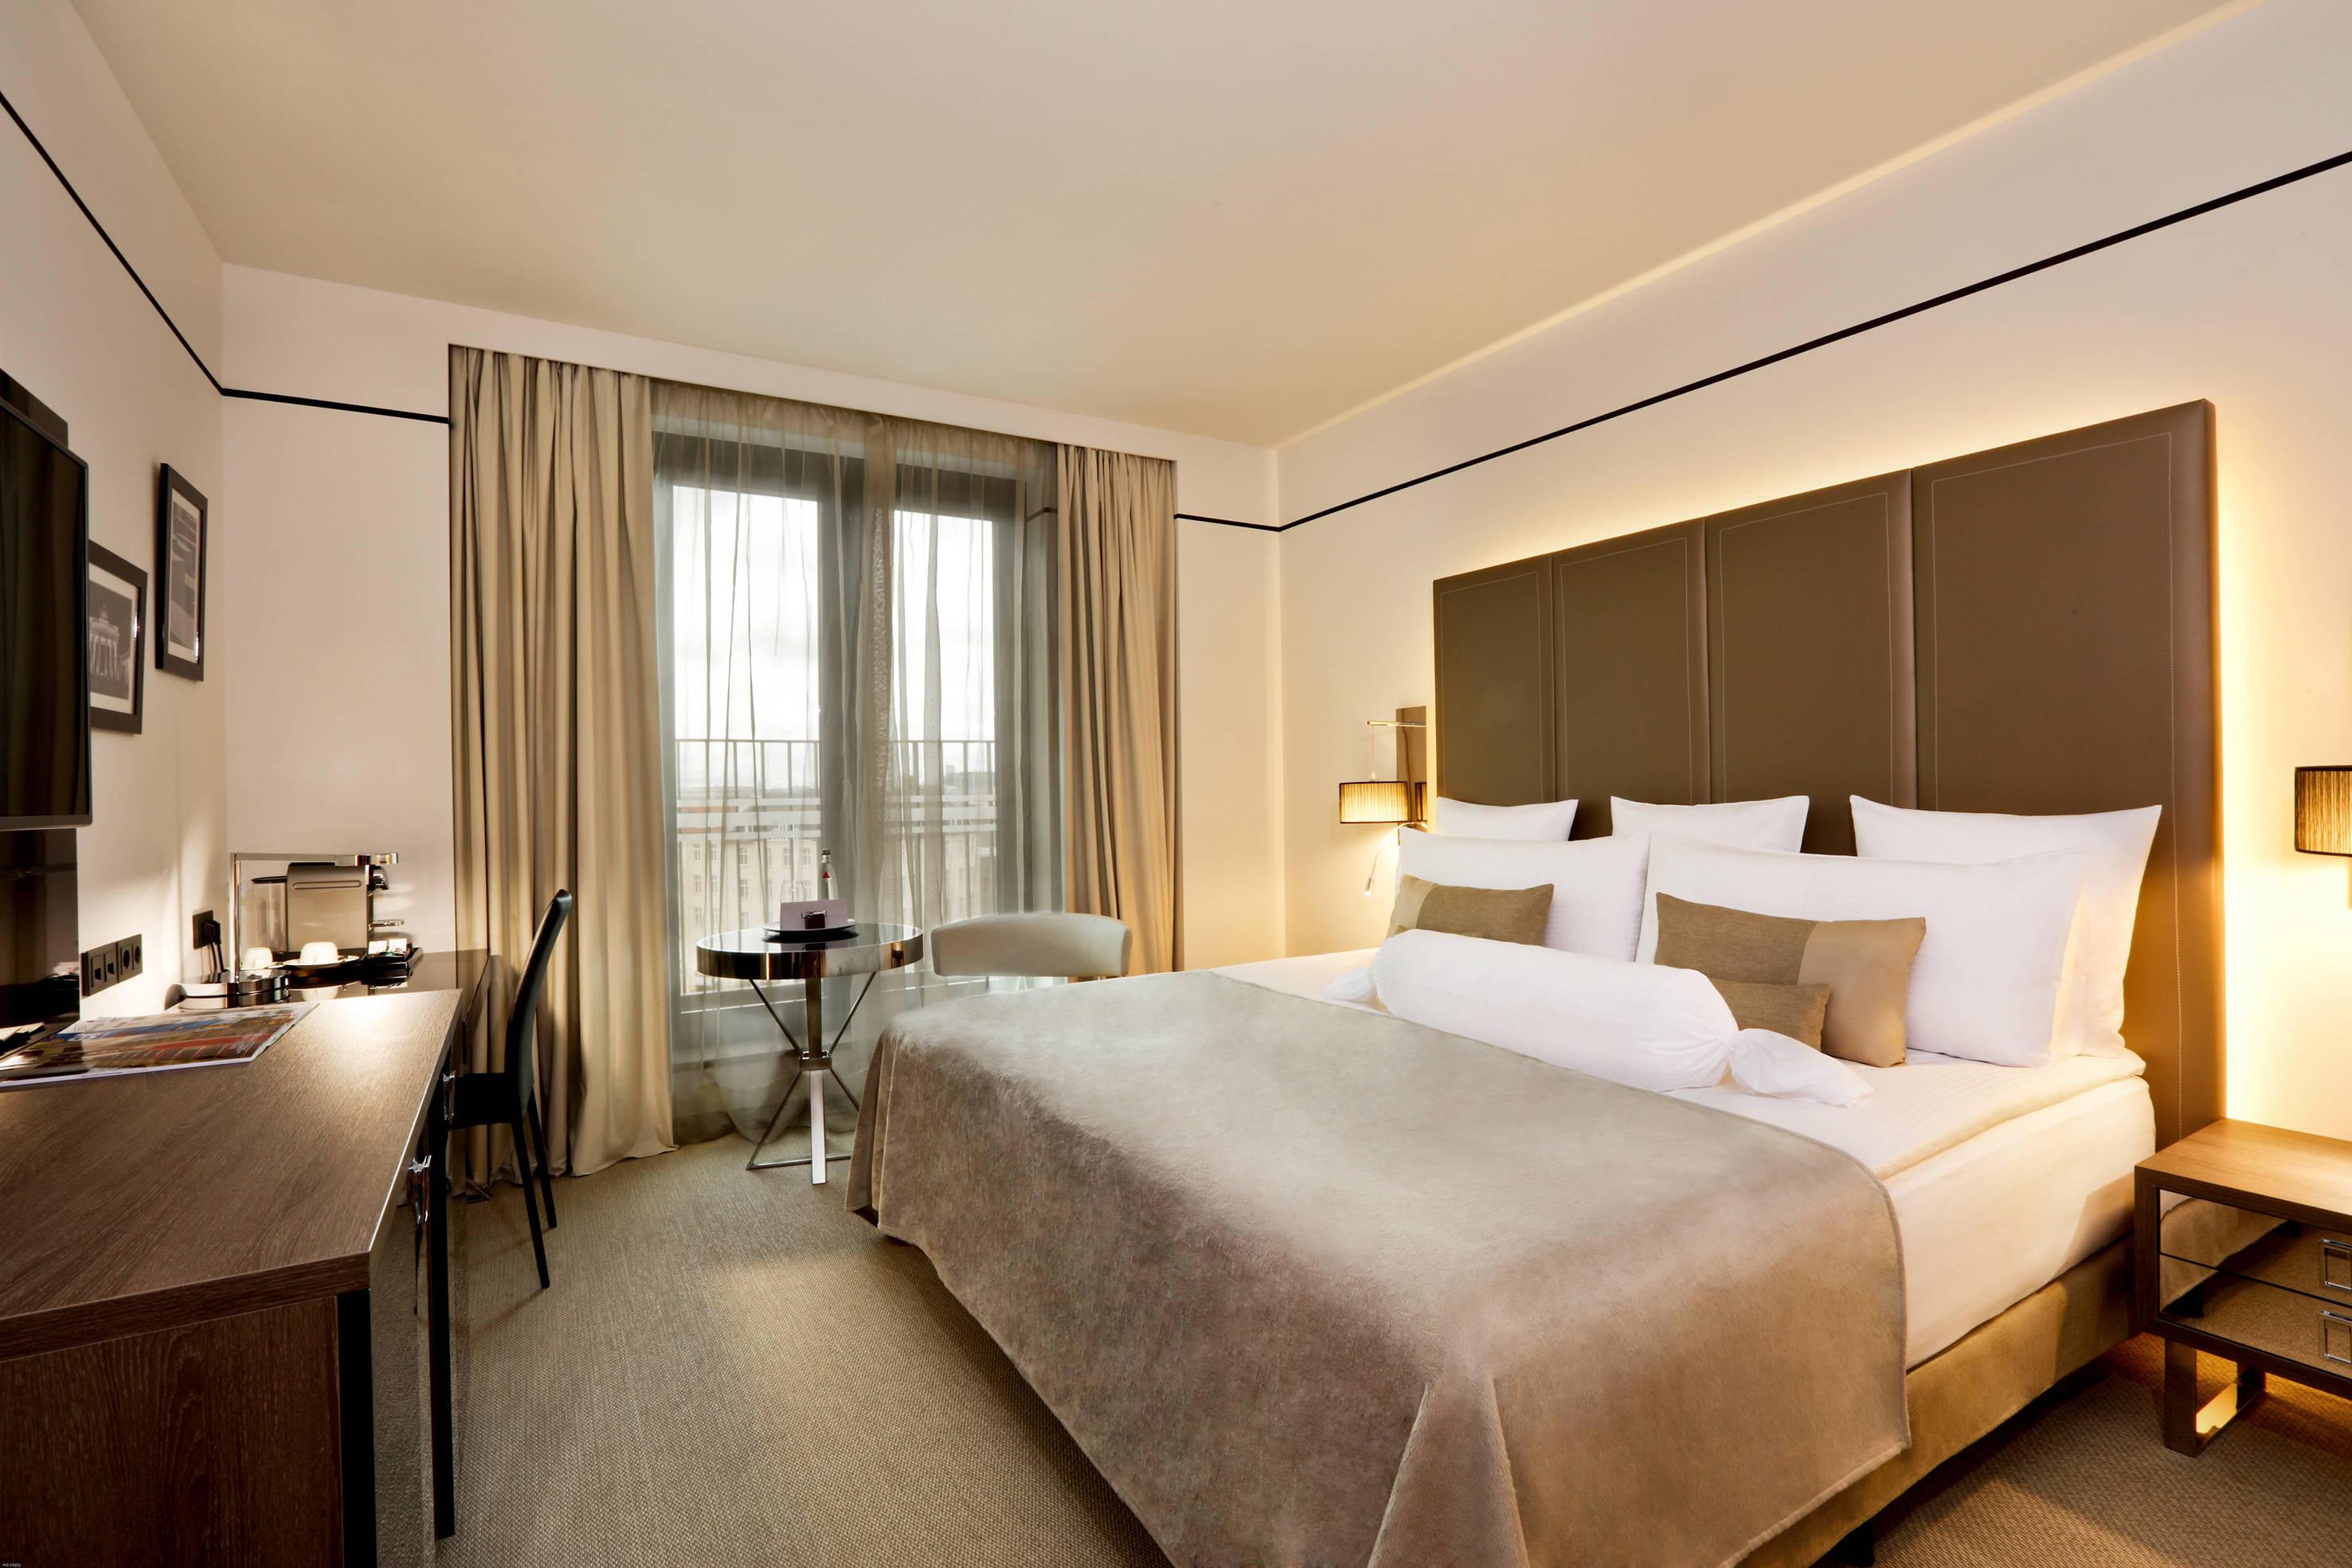 hotel melia berlin in berlin mitte holidaycheck berlin deutschland. Black Bedroom Furniture Sets. Home Design Ideas